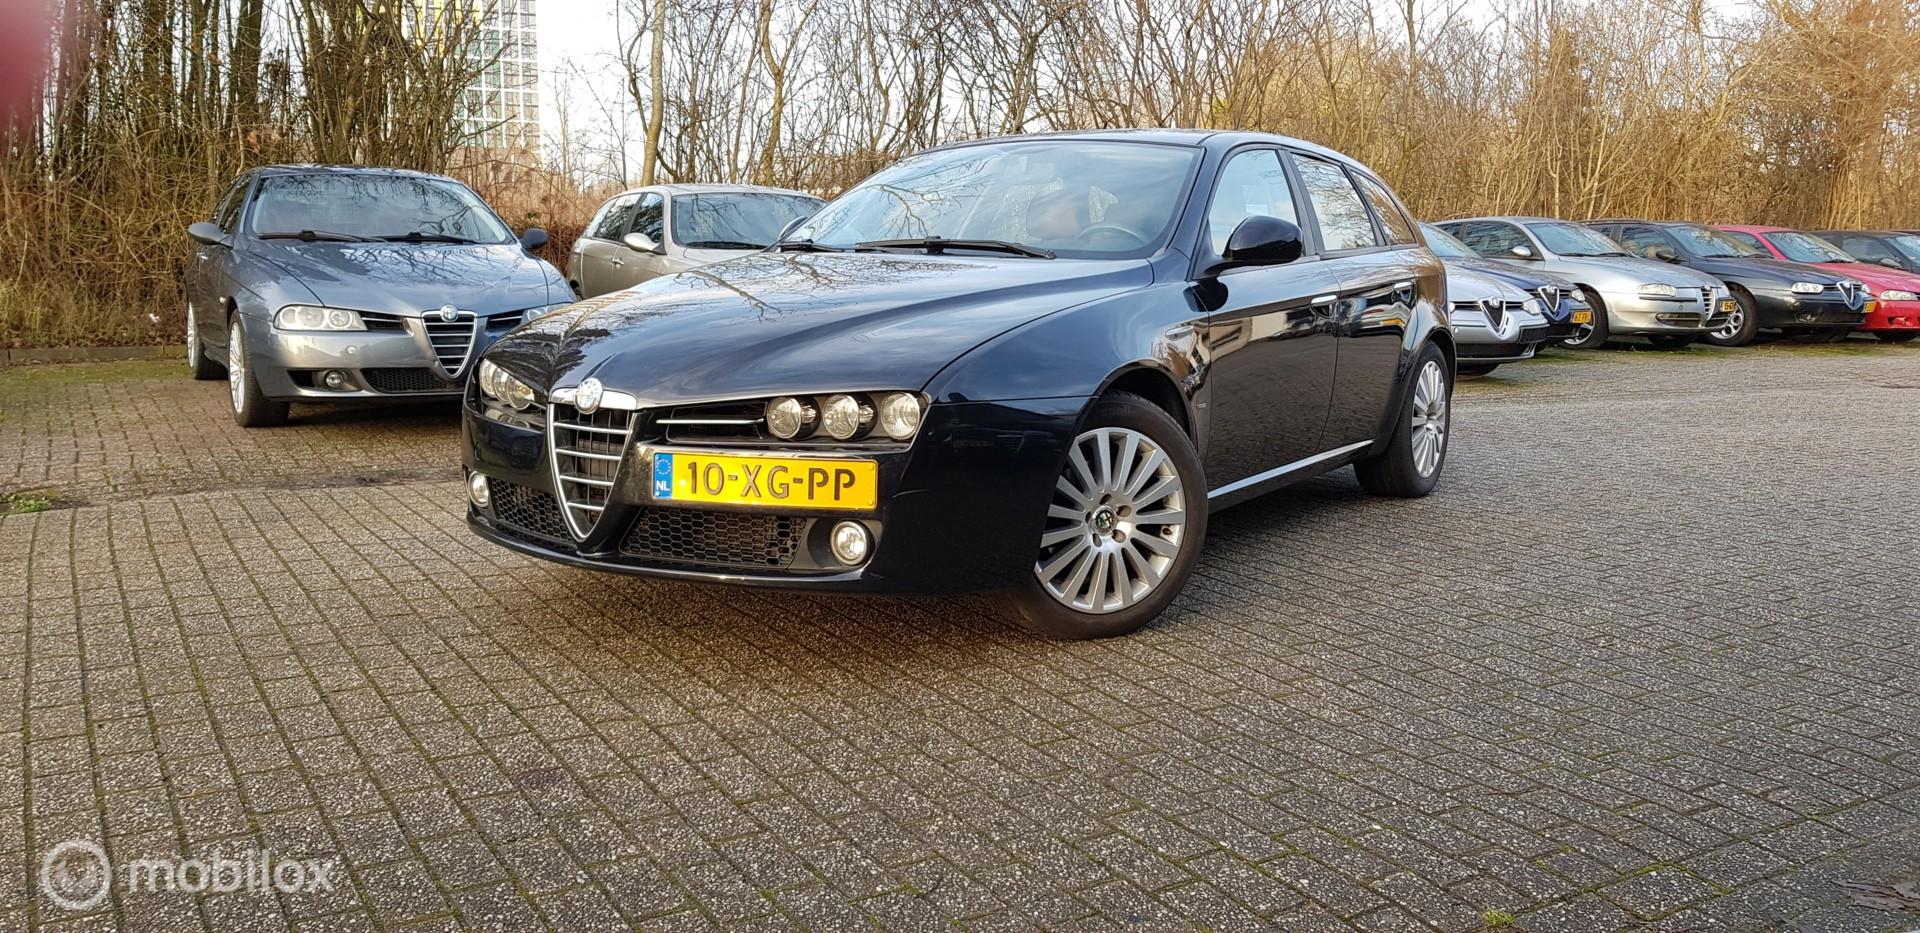 Alfa Romeo 159 SW 2.2 JTS NW. BND/KETTING/KOPPELING GR. BRT!!!